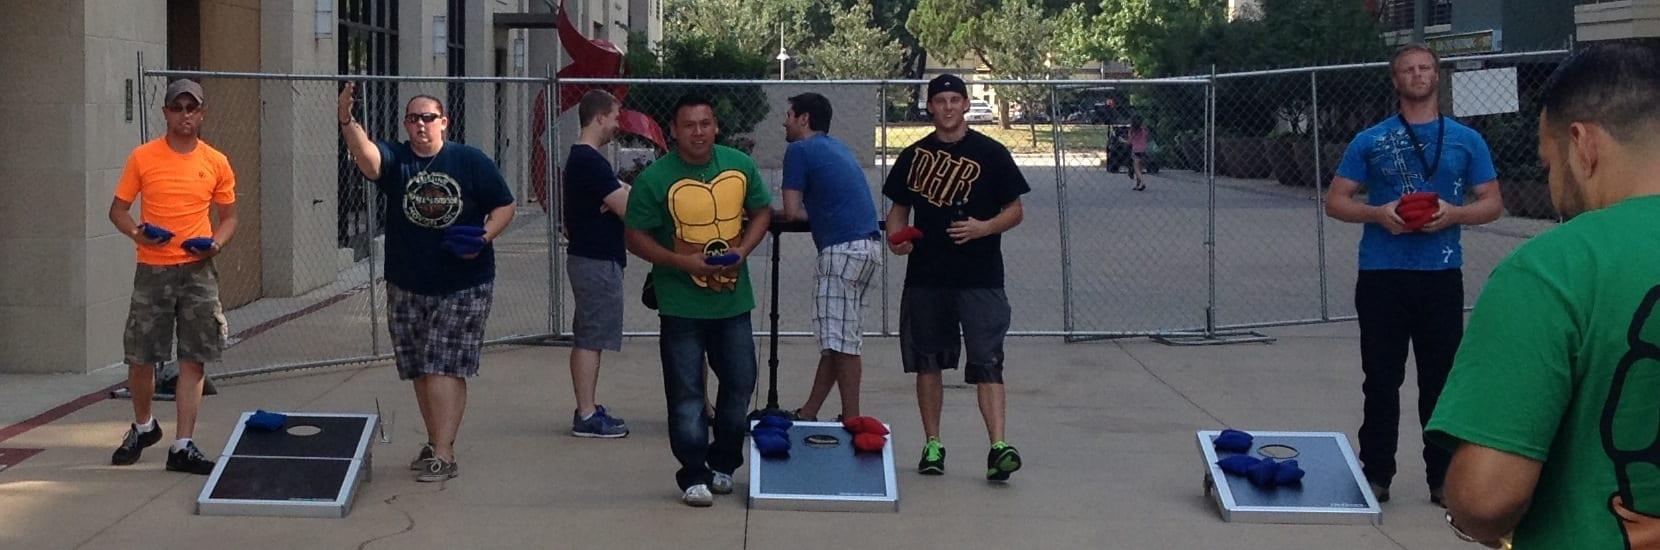 Dallas Bar Games Tournaments